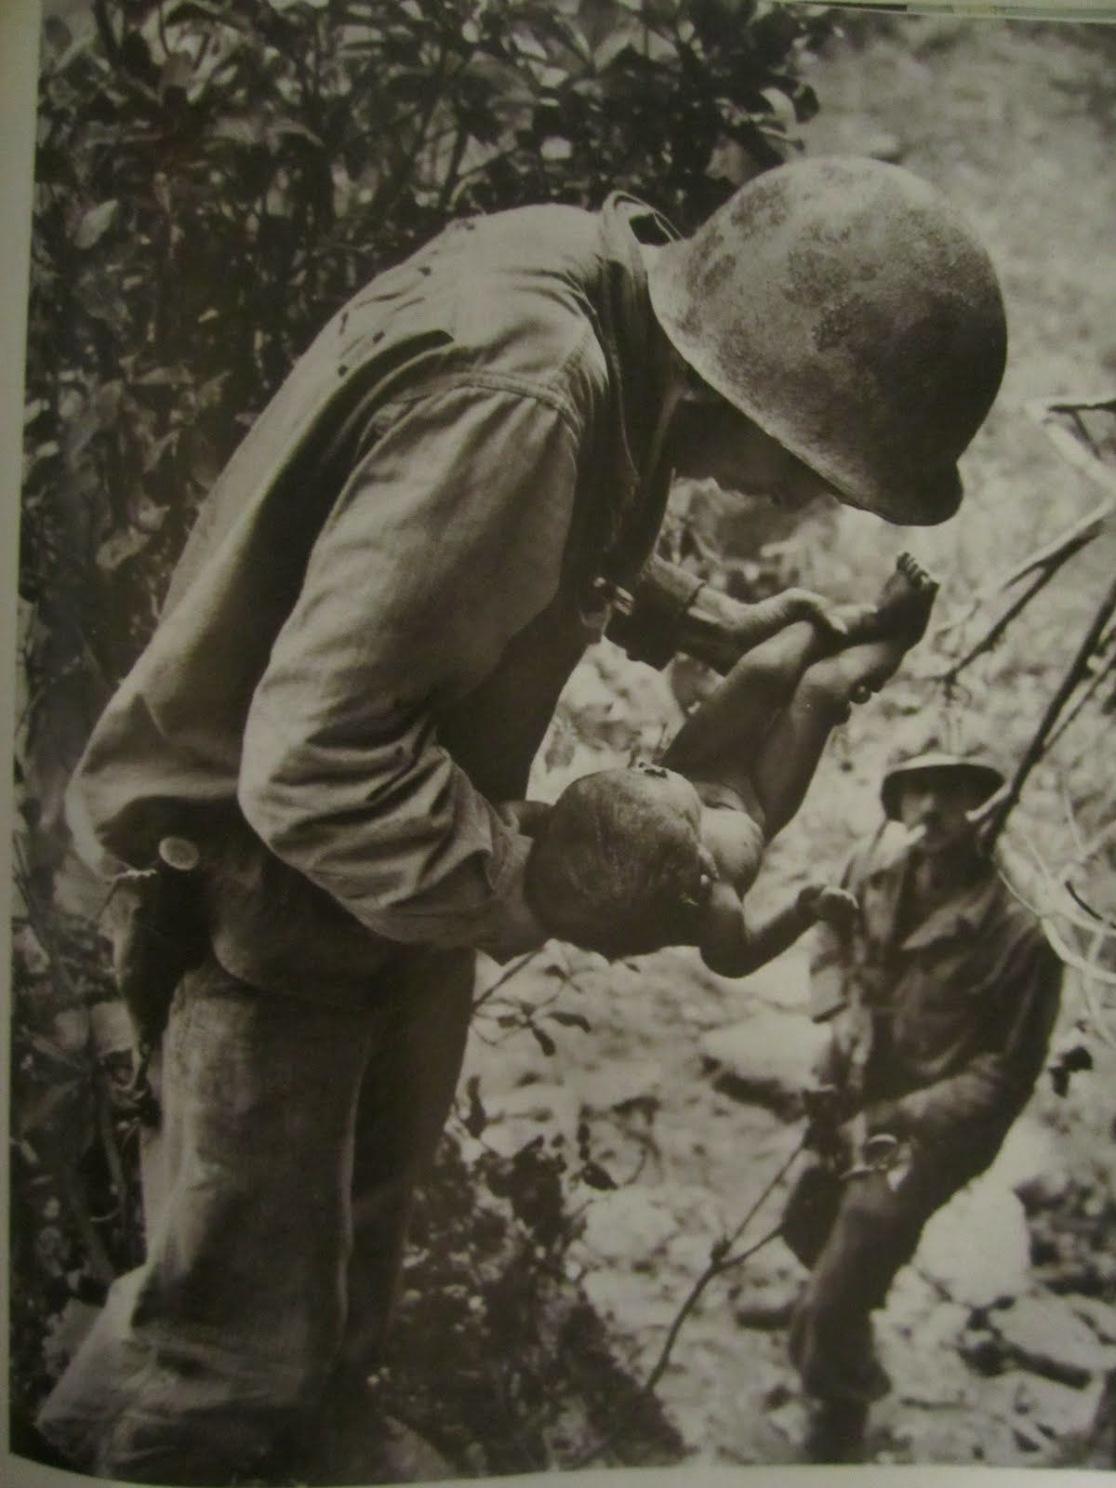 Okinawa shot, 1945